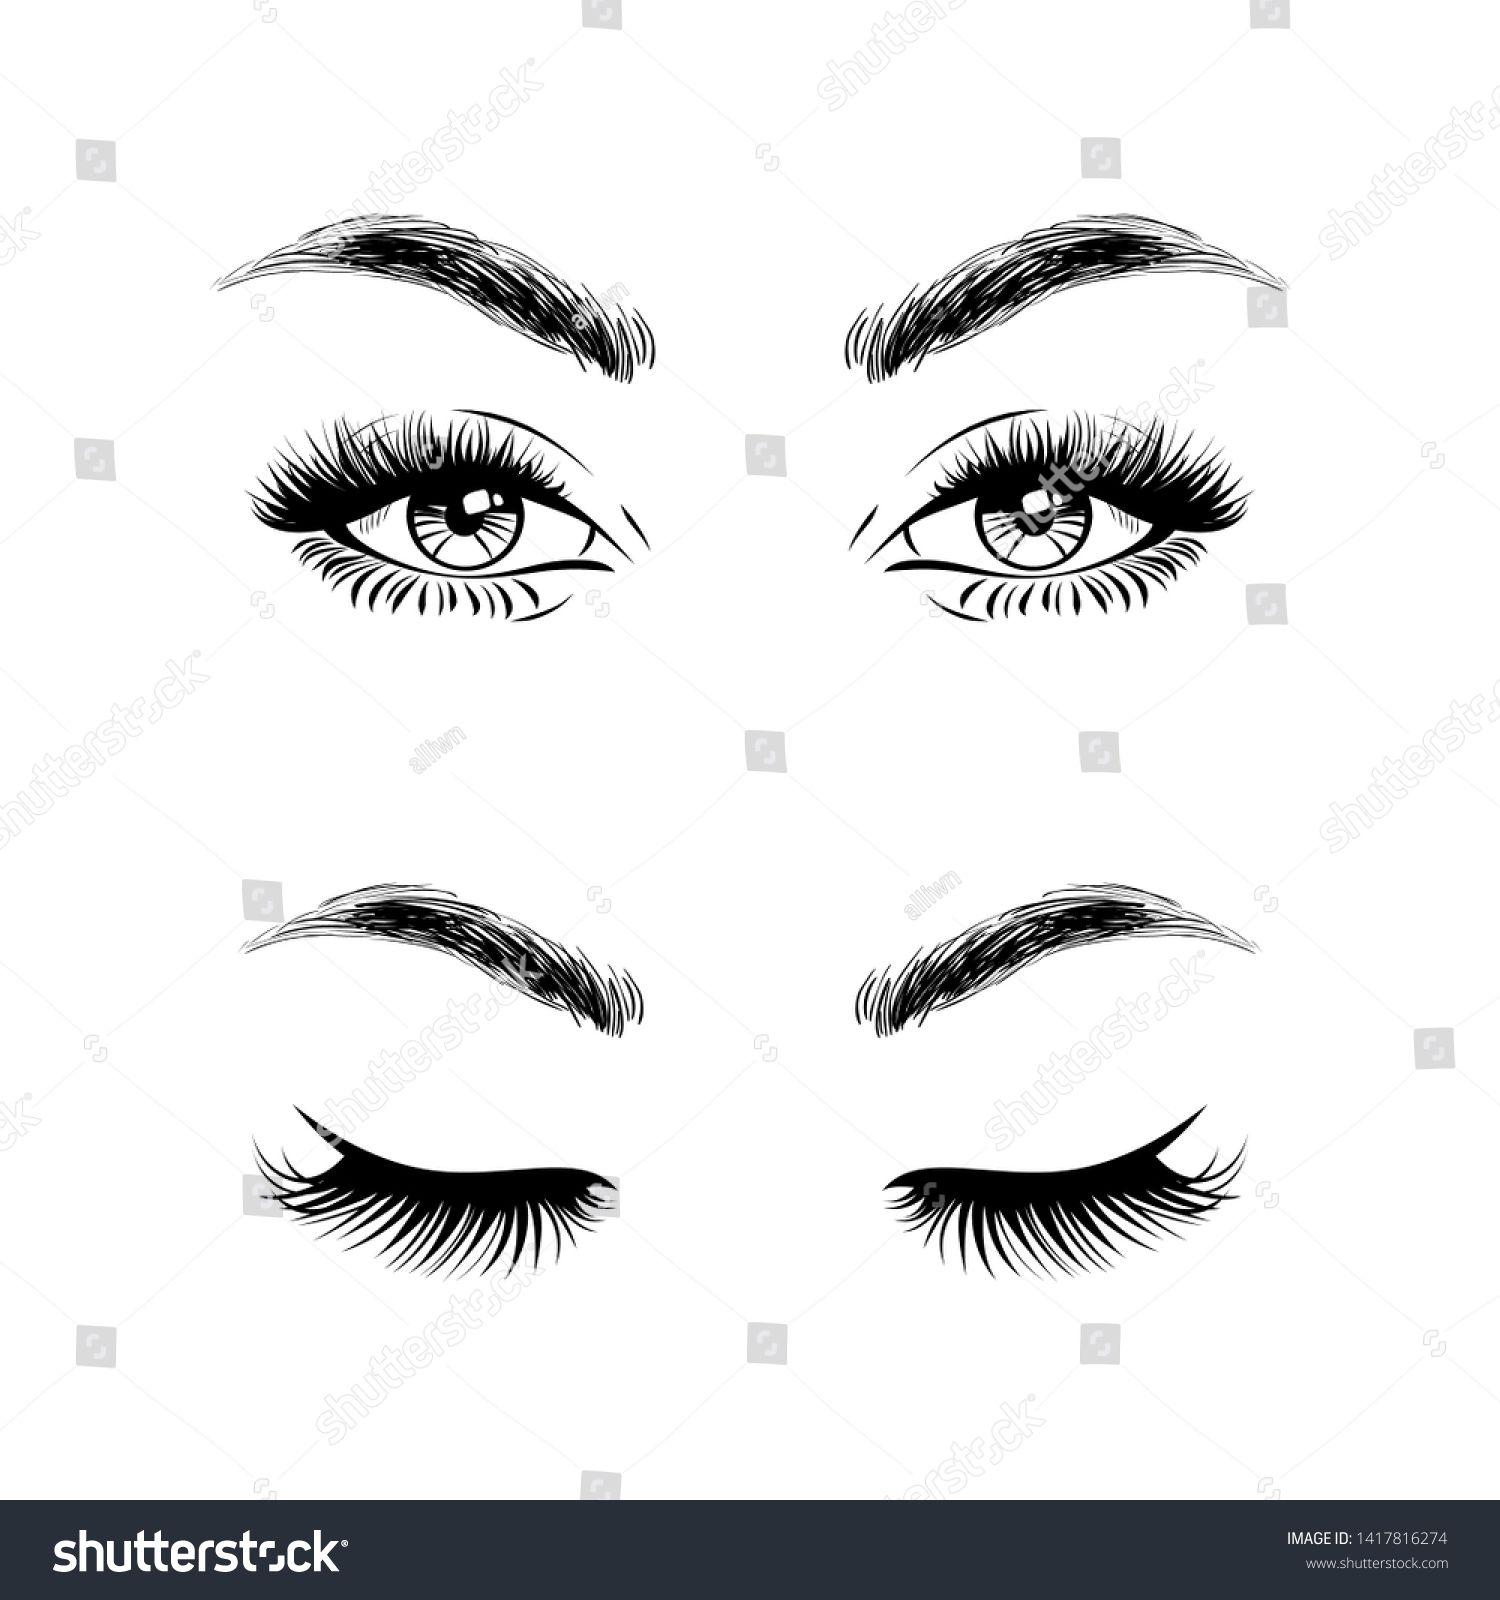 Set Open Eyes And Closed Eyes Beautiful Woman Face Eyebrows And Lush Eyelashes Lashes Extensions Beauty Logo Beautiful Women Faces Closed Eyes Woman Face